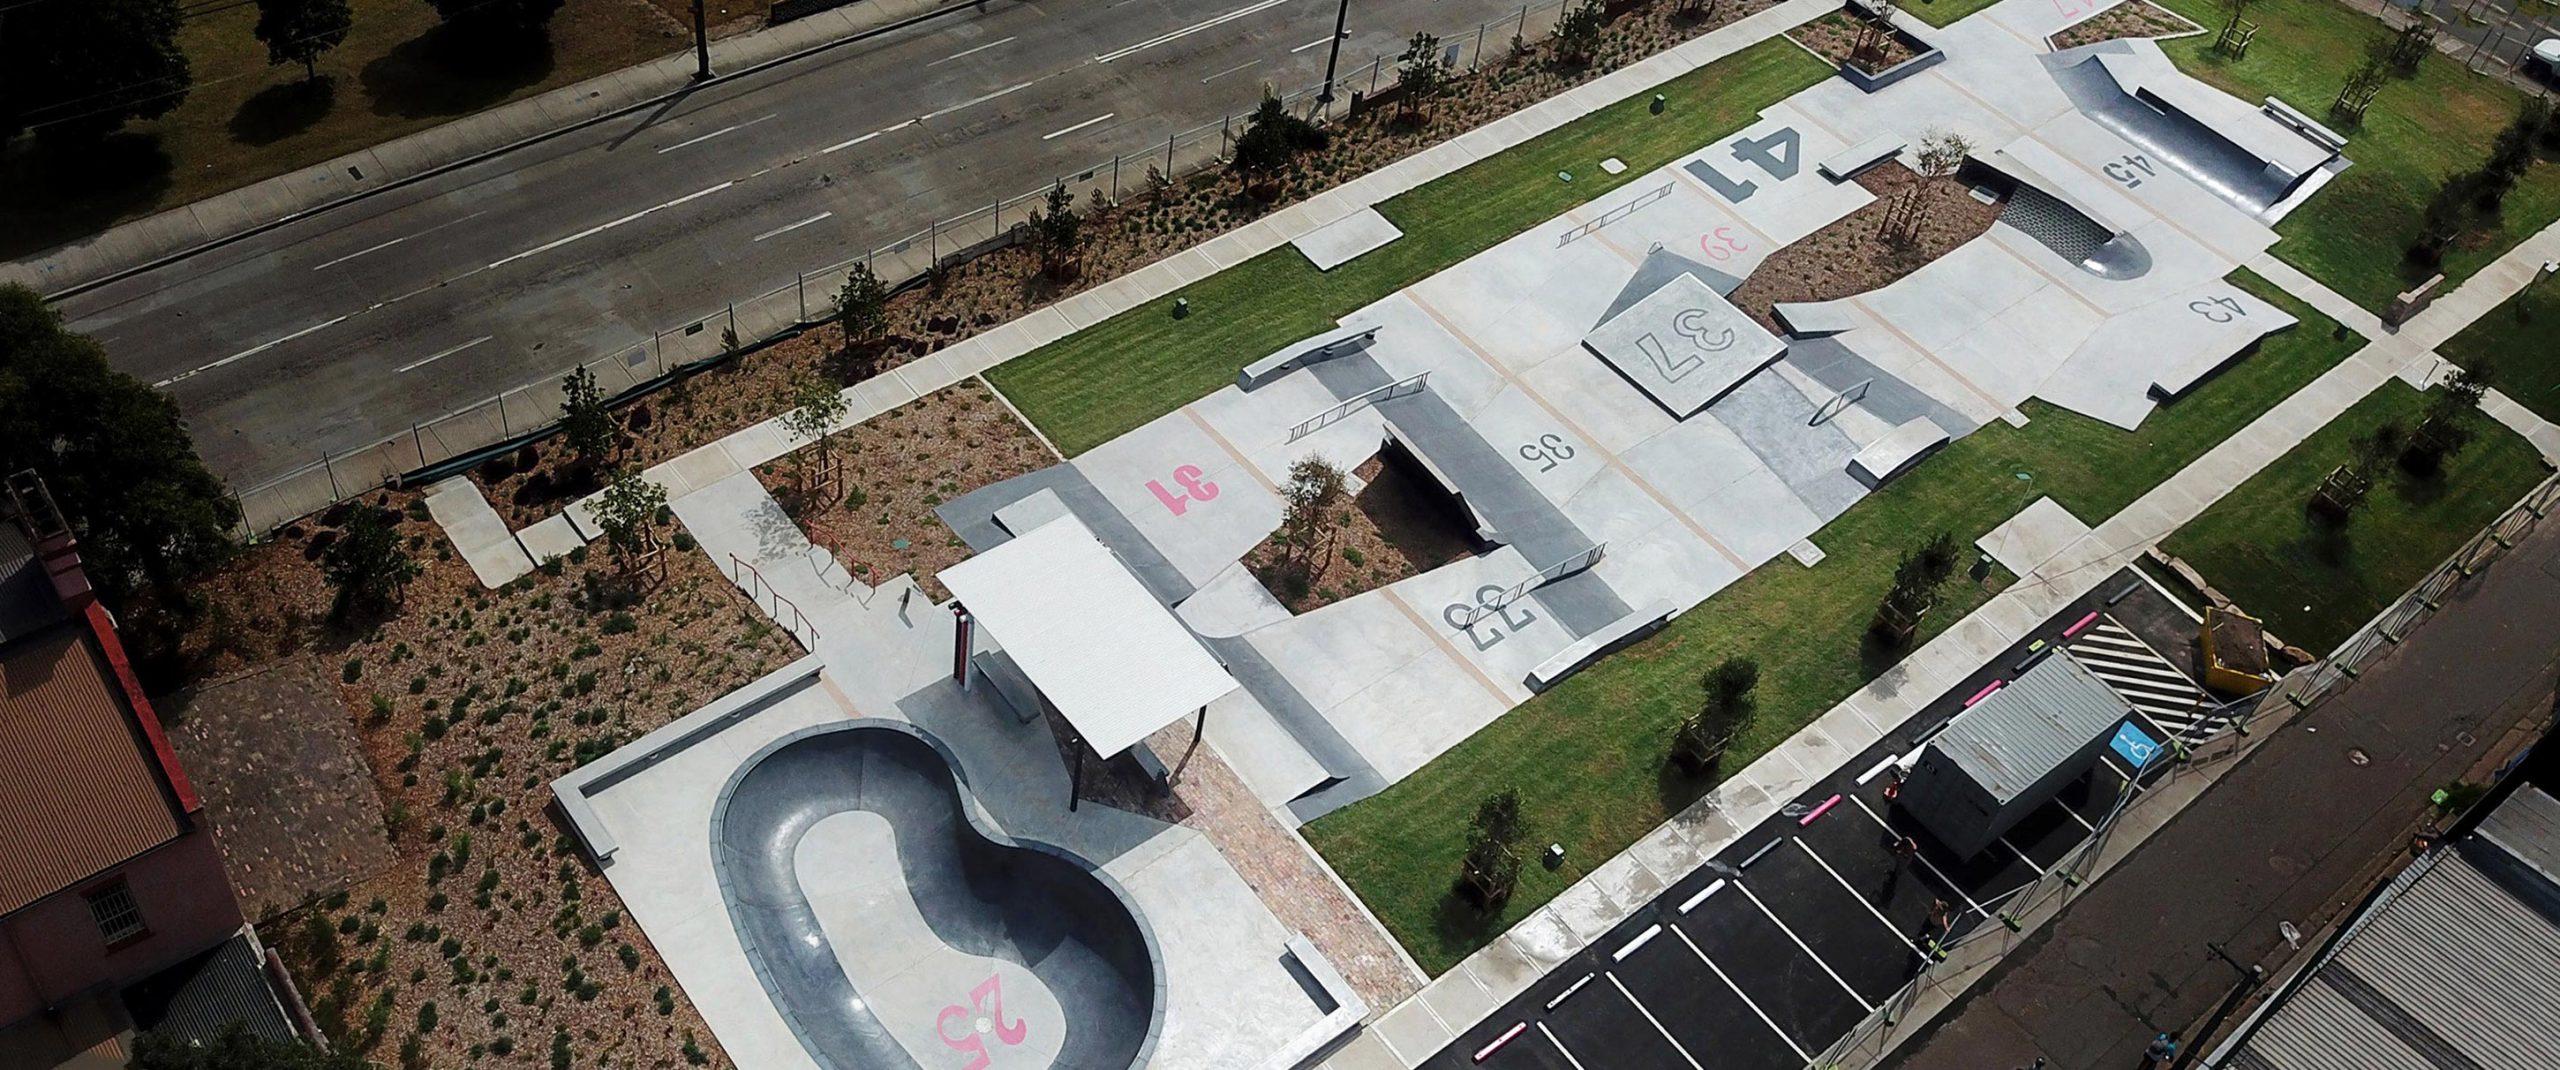 Sydenham Skate Park Overview